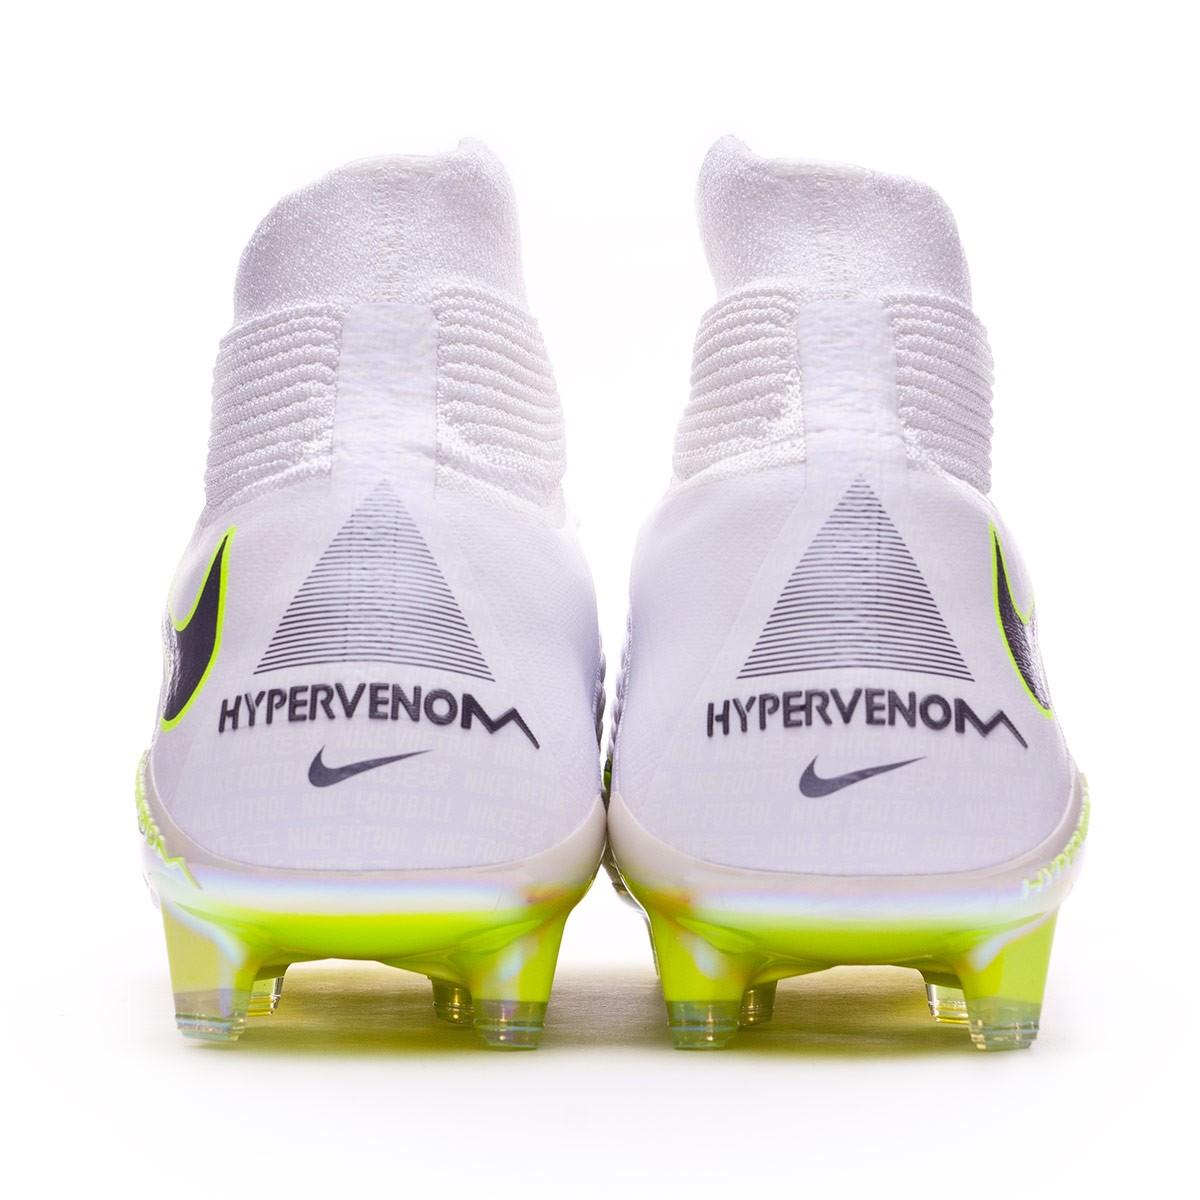 d421bc3996b Football Boots Nike Hypervenom Phantom III Elite DF FG White-Metallic cool  grey-Volt-Metallic cool g - Football store Fútbol Emotion